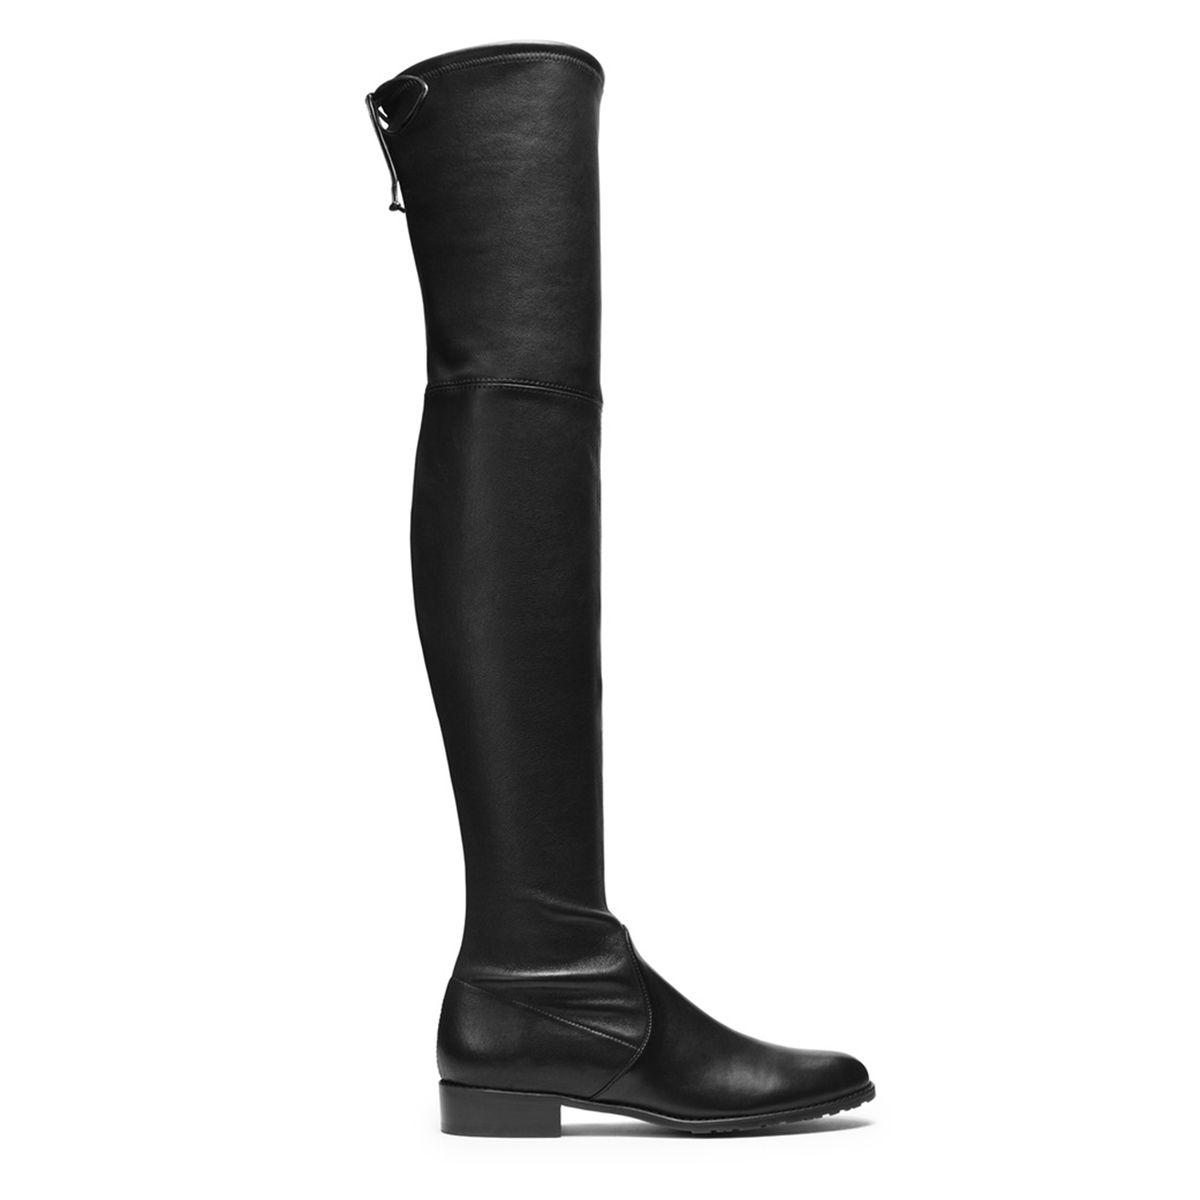 Stuart Weitzman Lowland Boot, $885